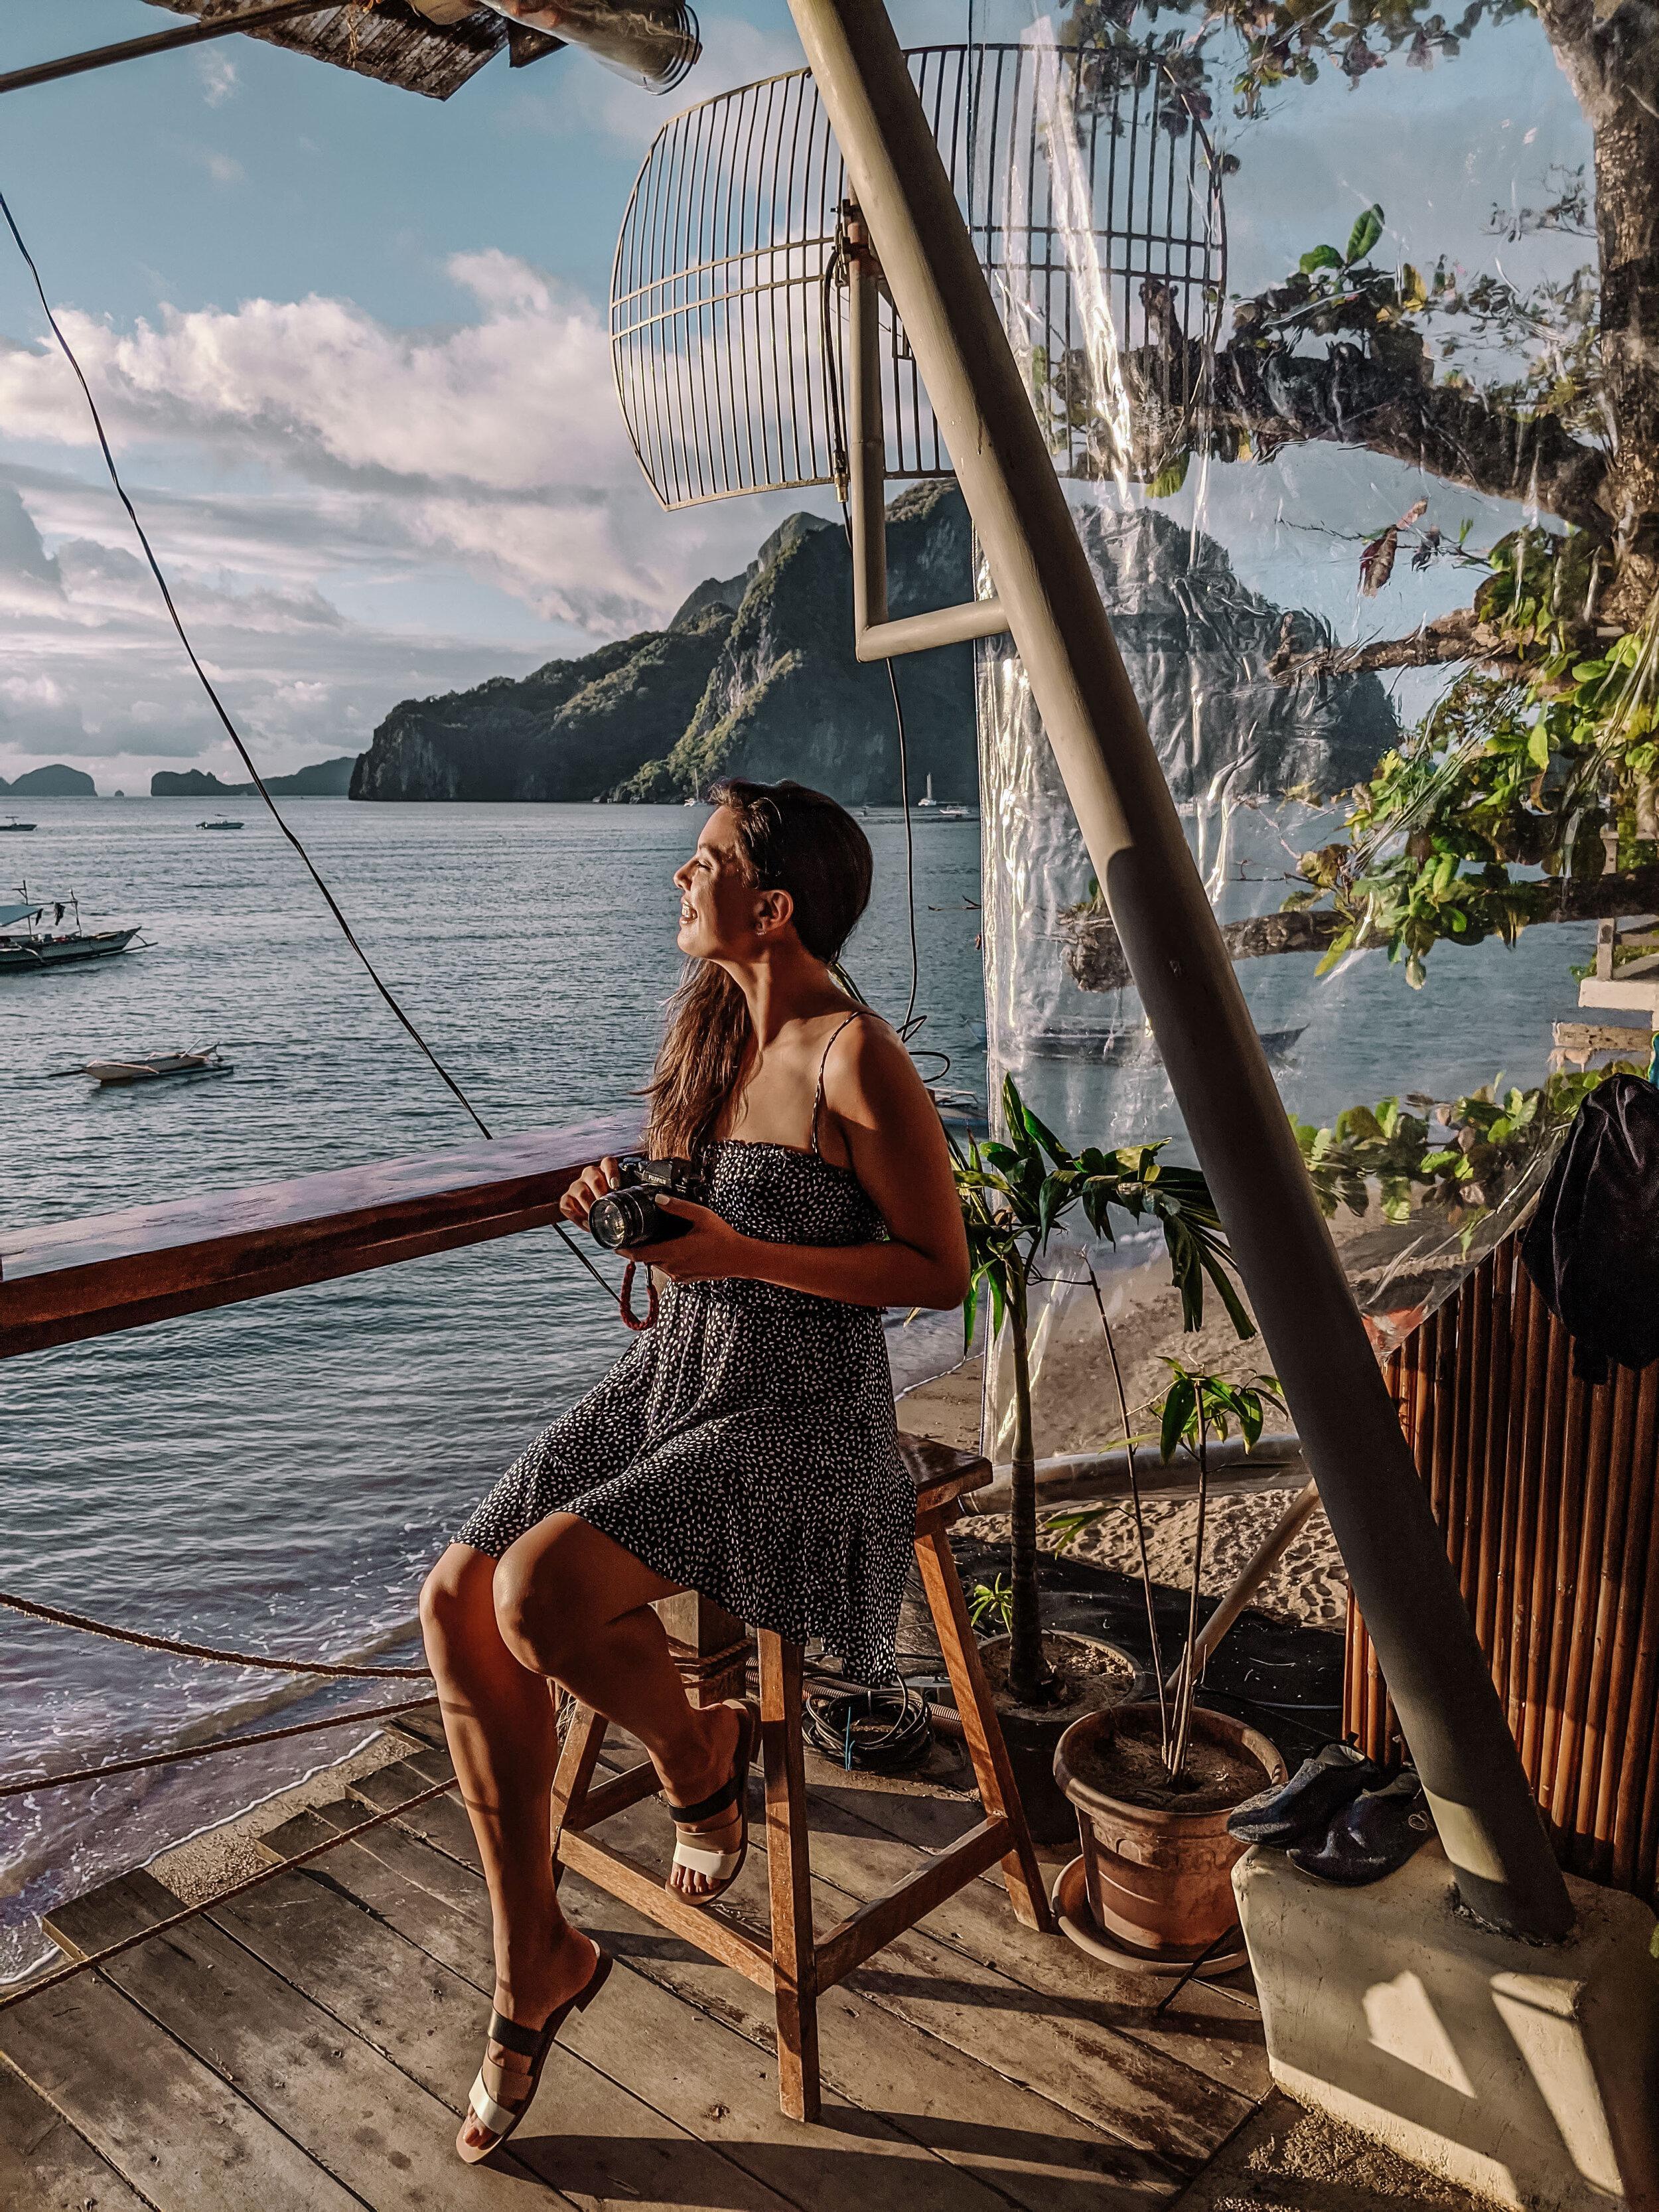 Rachel Off Duty; Woman at Corong-Corong Beach, Philippines